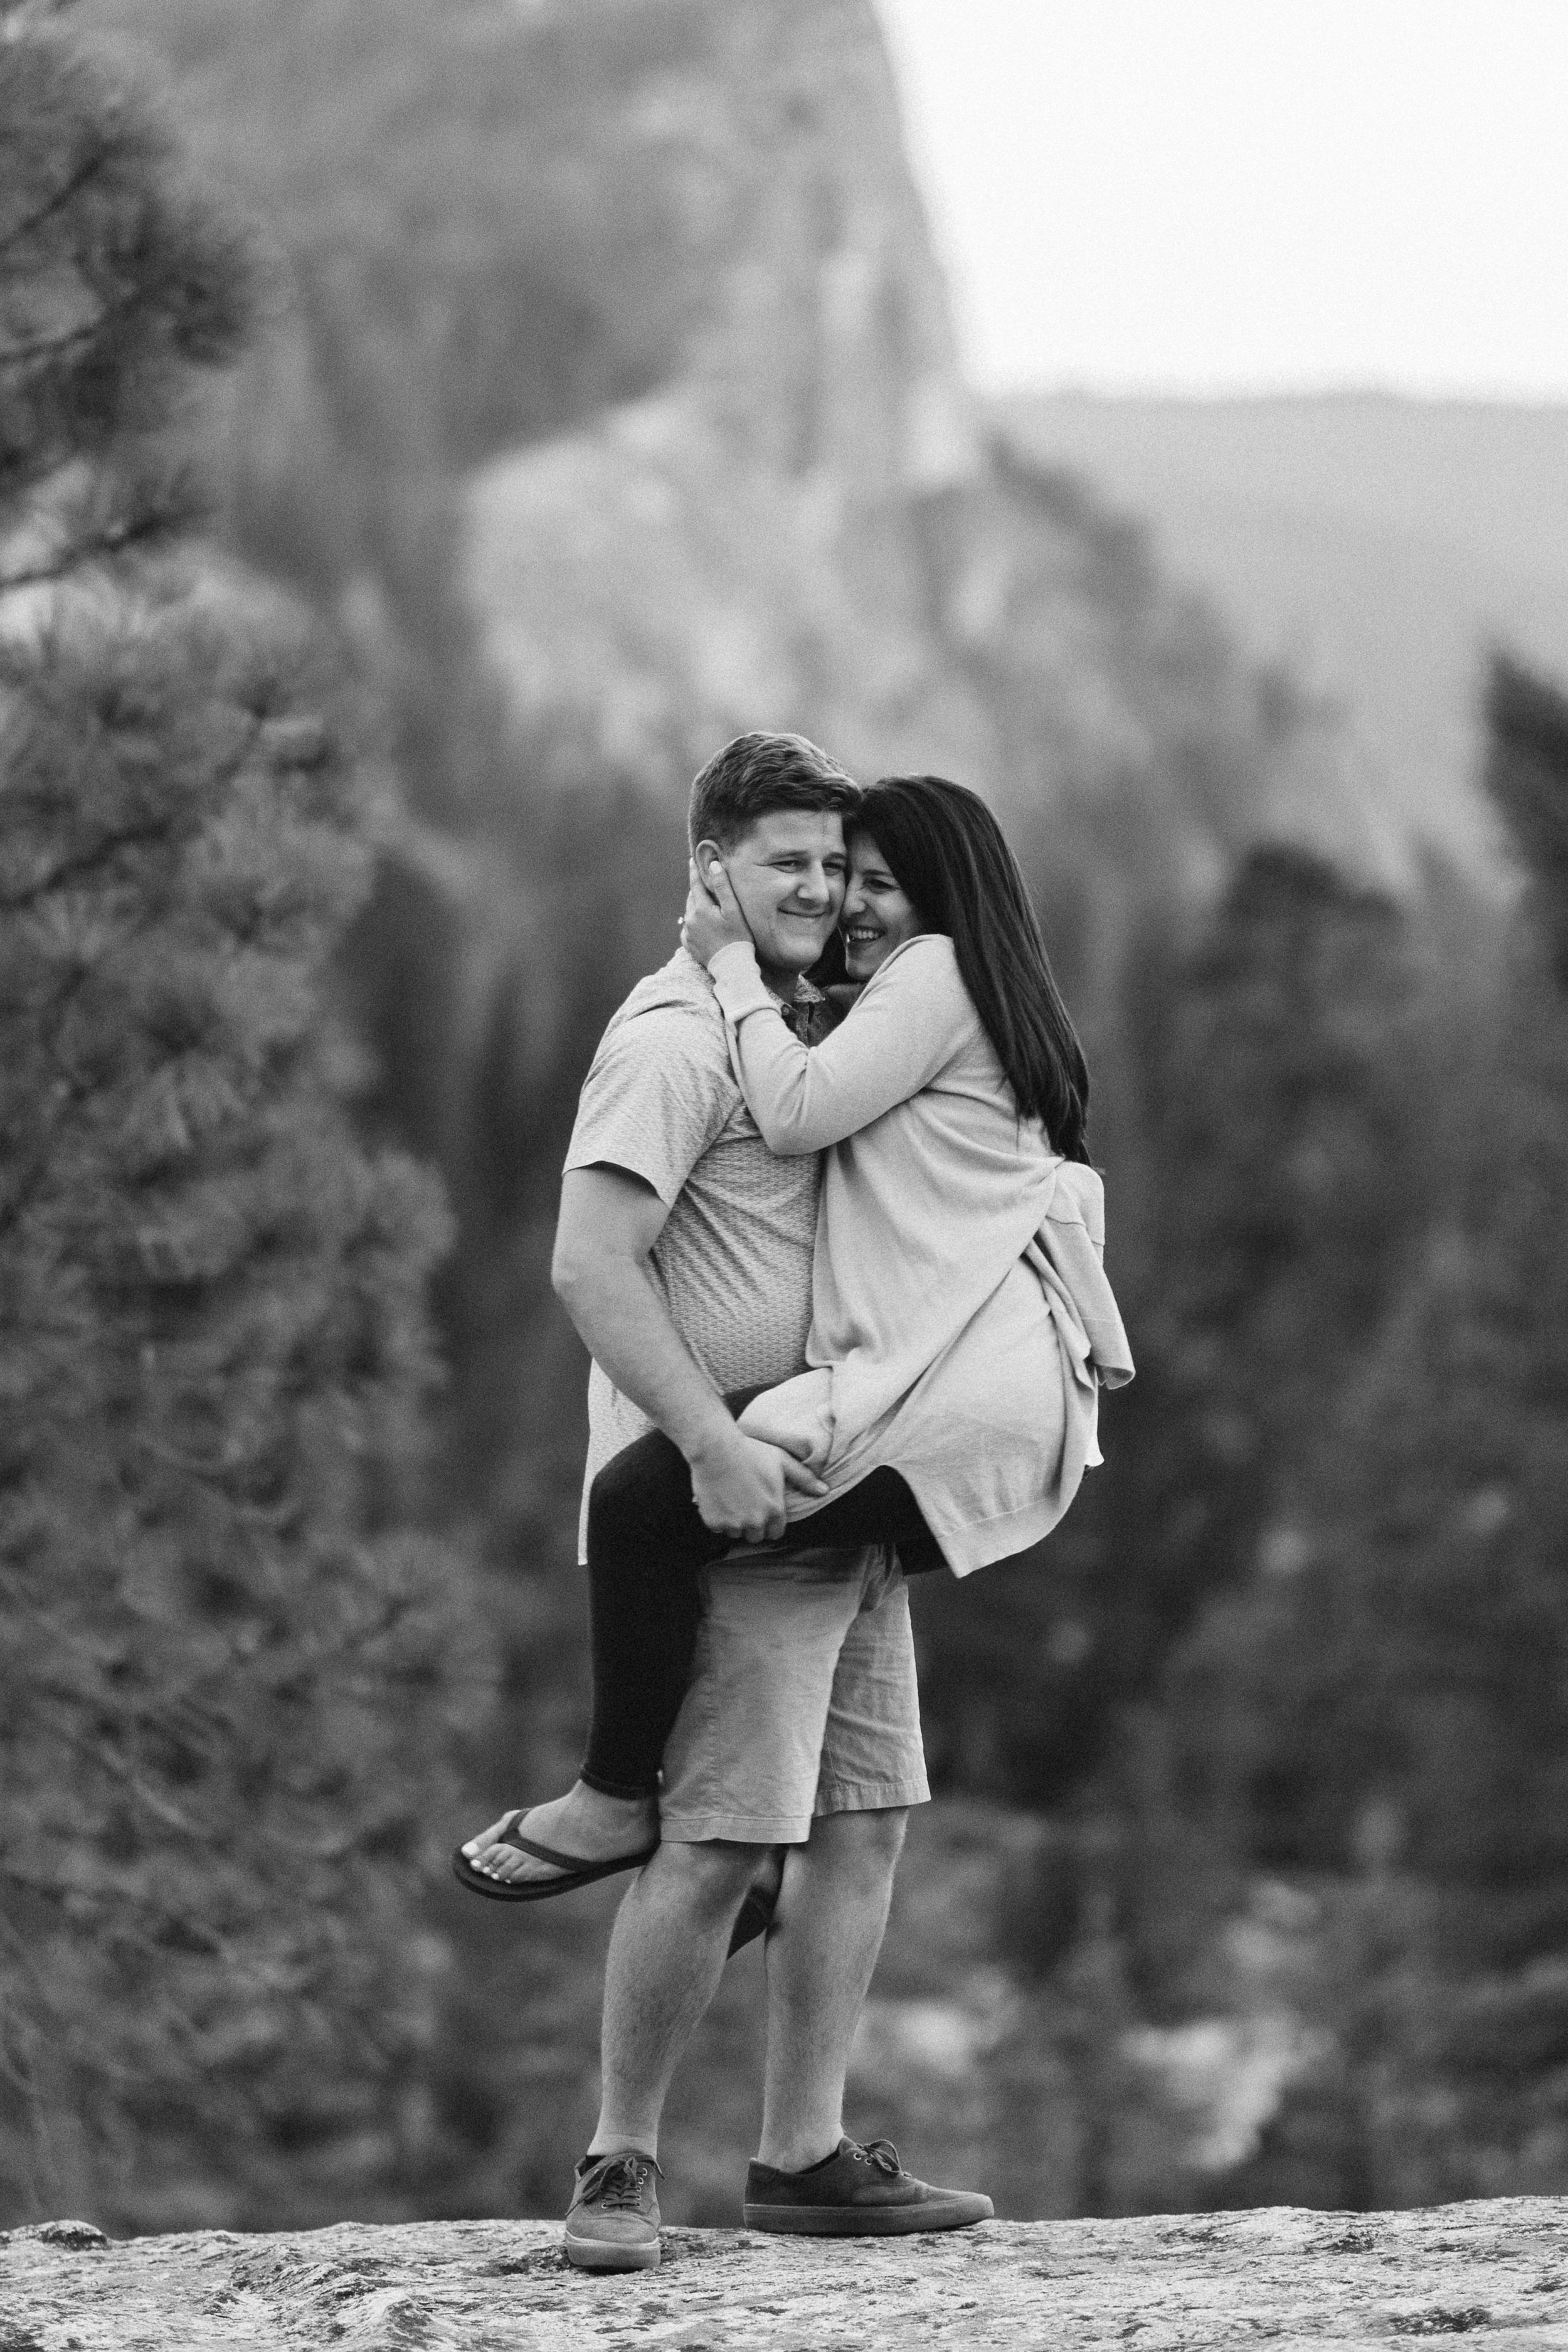 nicole-daacke-photography-fun-adventure-session-waterfall-lake-tahoe-sunset-destination-wedding-photographer-northern-california-elopement-photographer-32.jpg